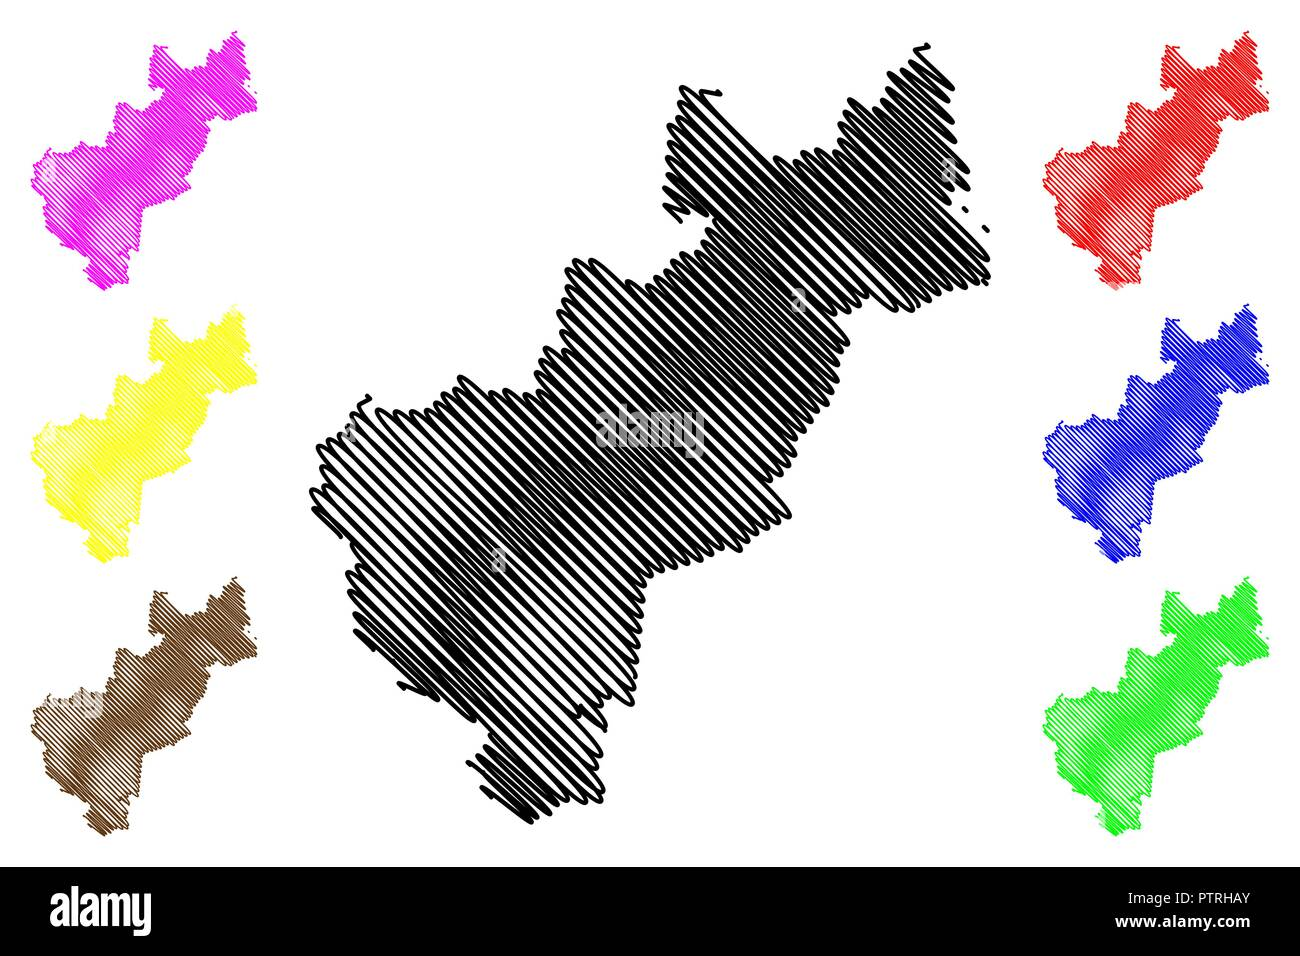 Queretaro (United Mexican States, Mexico, federal republic) map ...